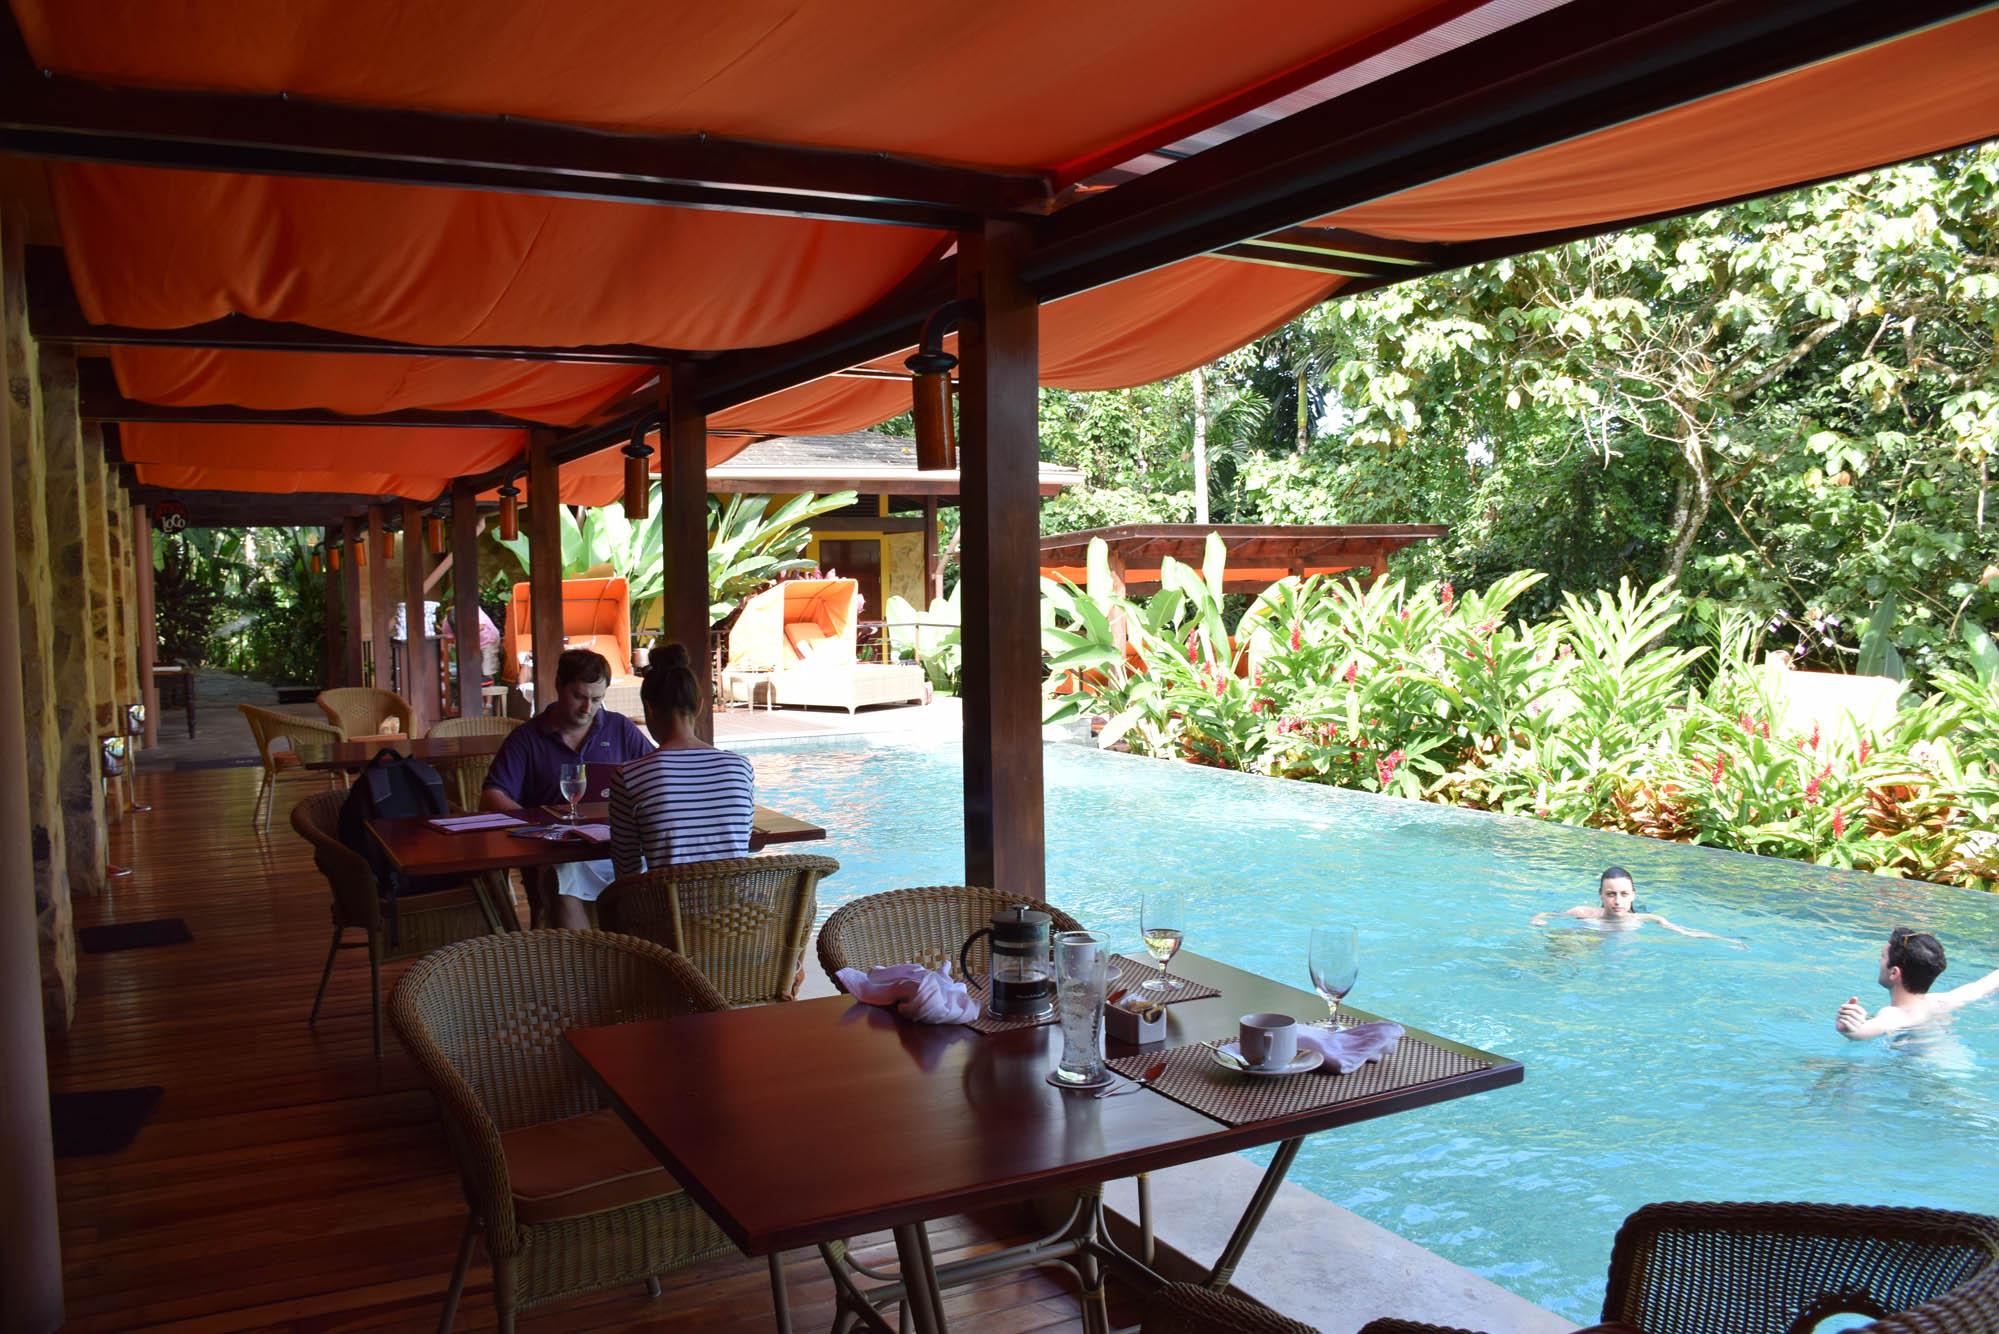 Parte externa do restaurante Amor Loco (Nayara Springs Hotel - La Fortuna/Arenal - Costa Rica)